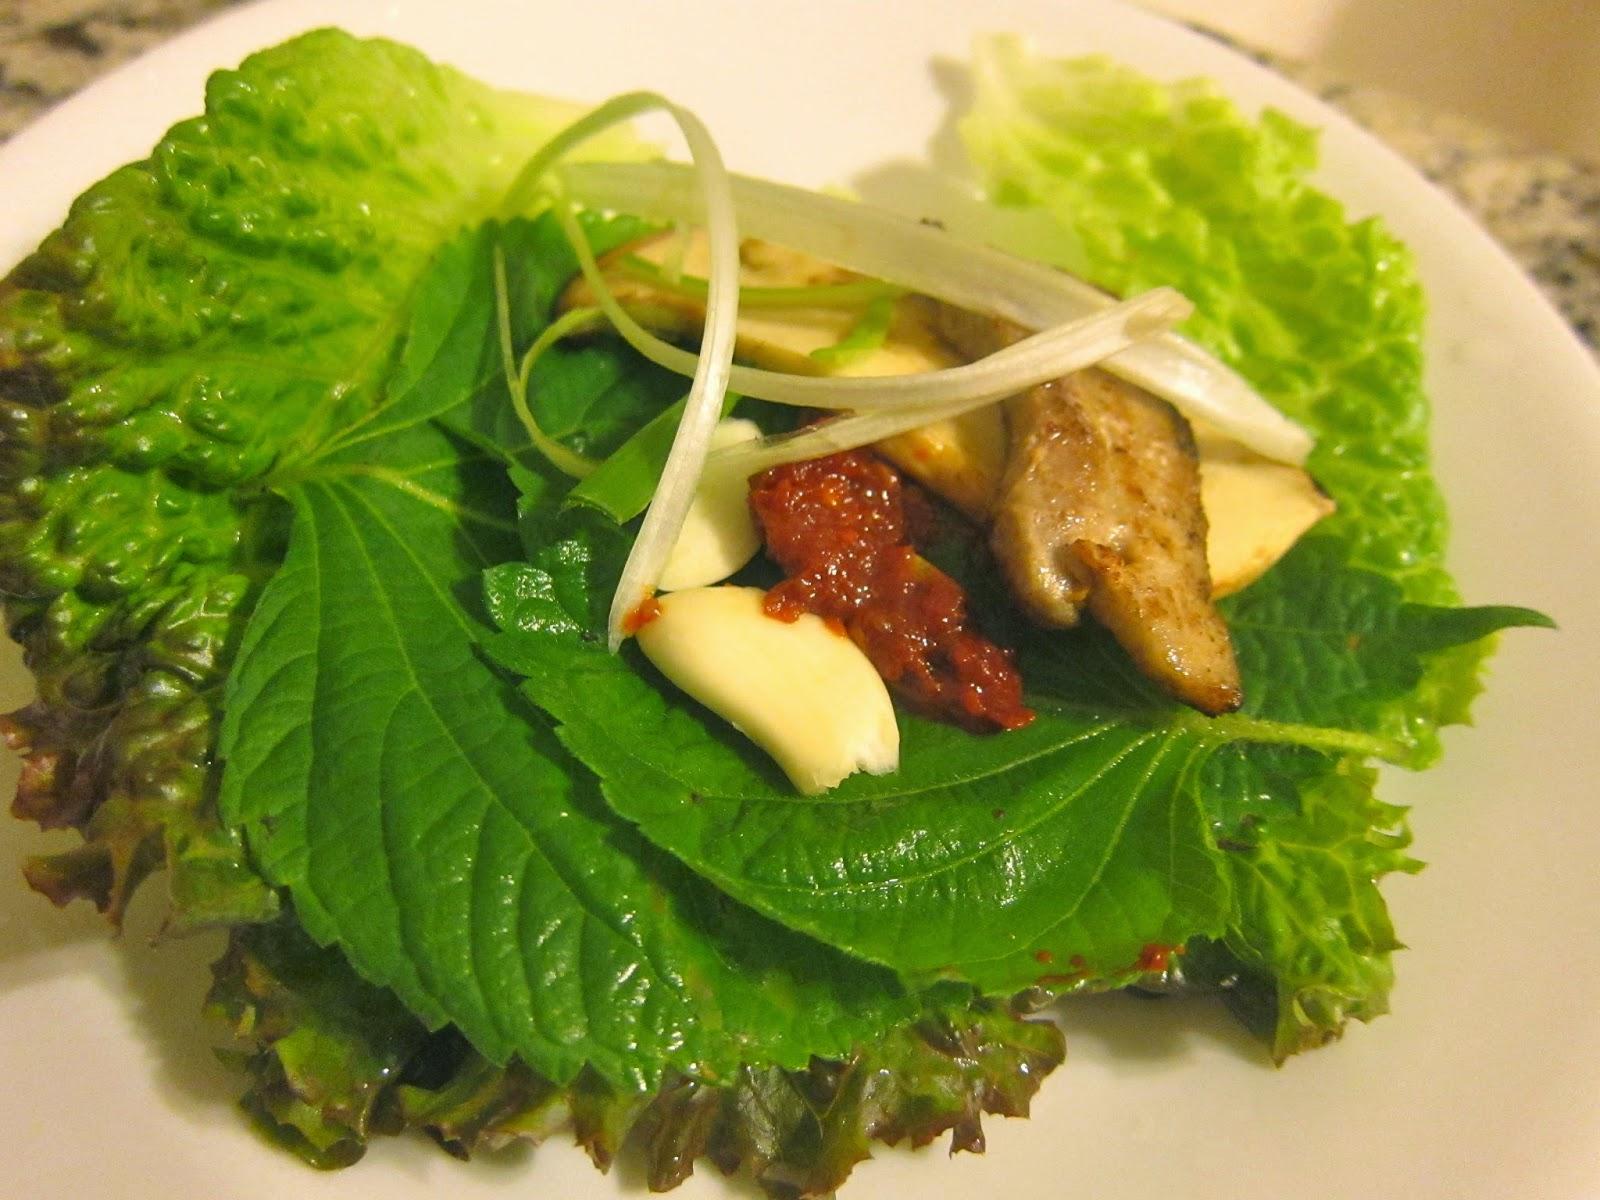 Grilled pork belly with Korean kochu jang, dang jang, perilla leaves and red leaf lettuce